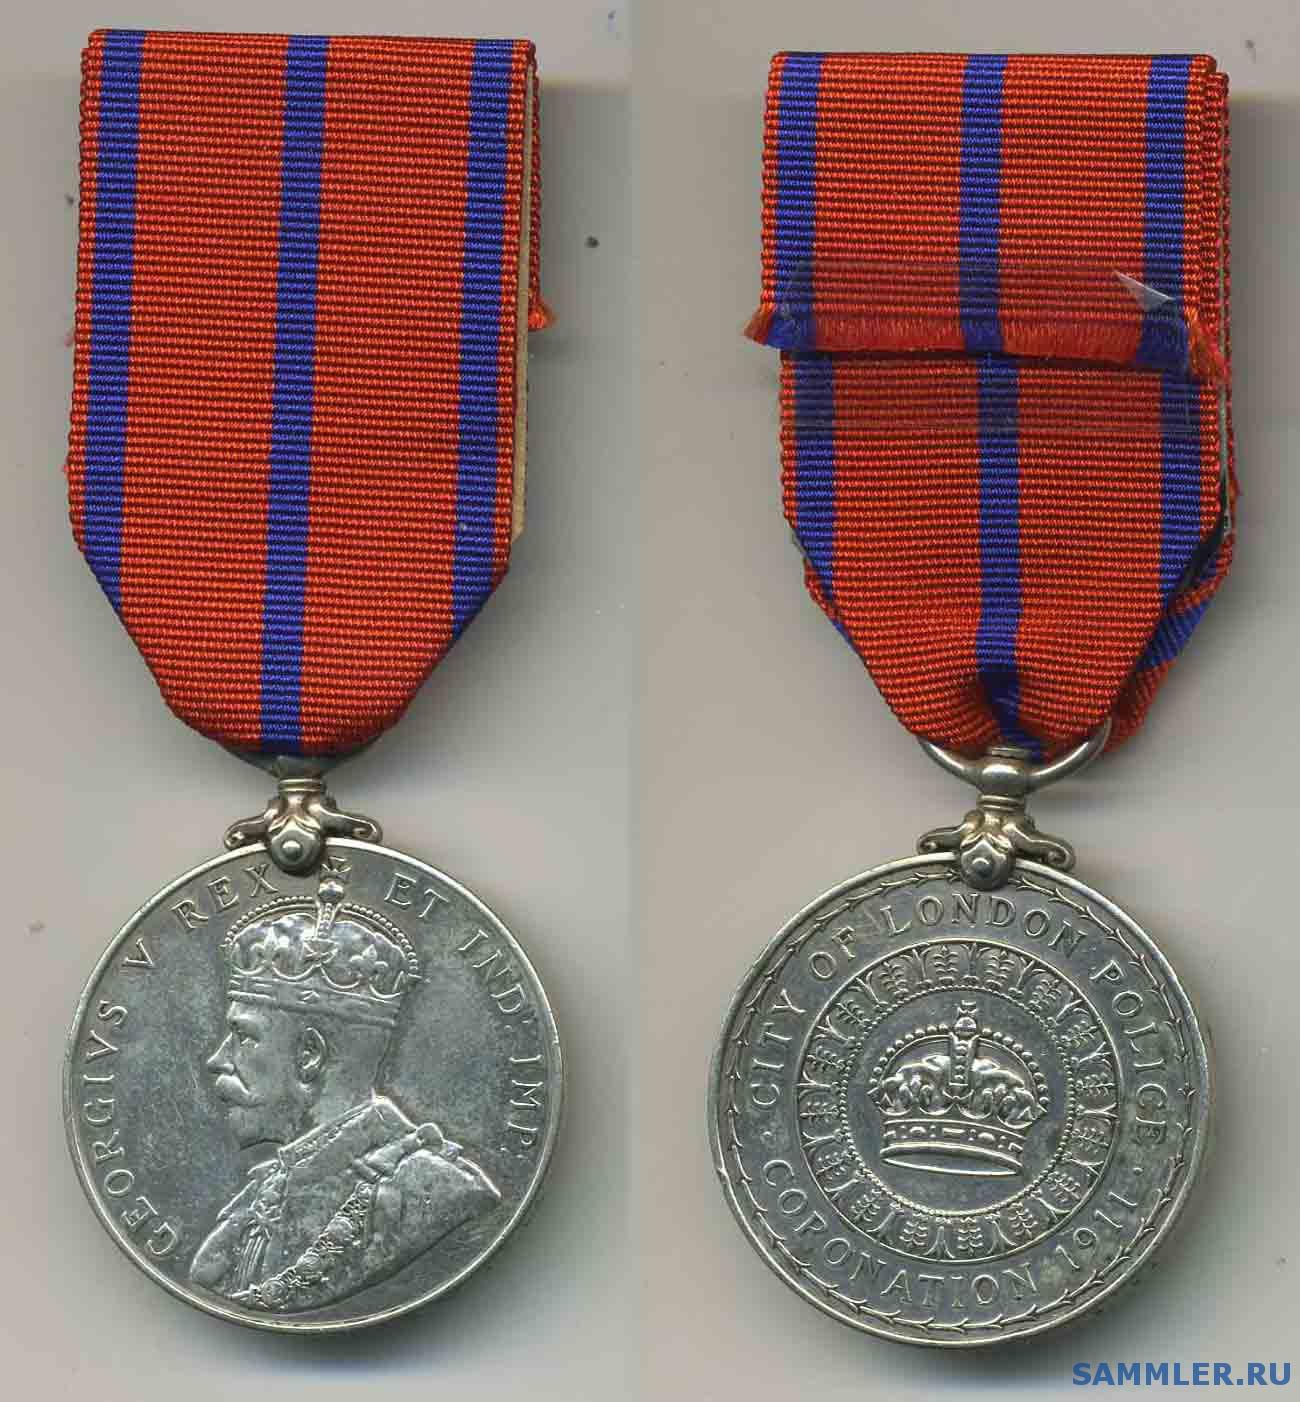 Coronation_1911_City_of_London_.jpg